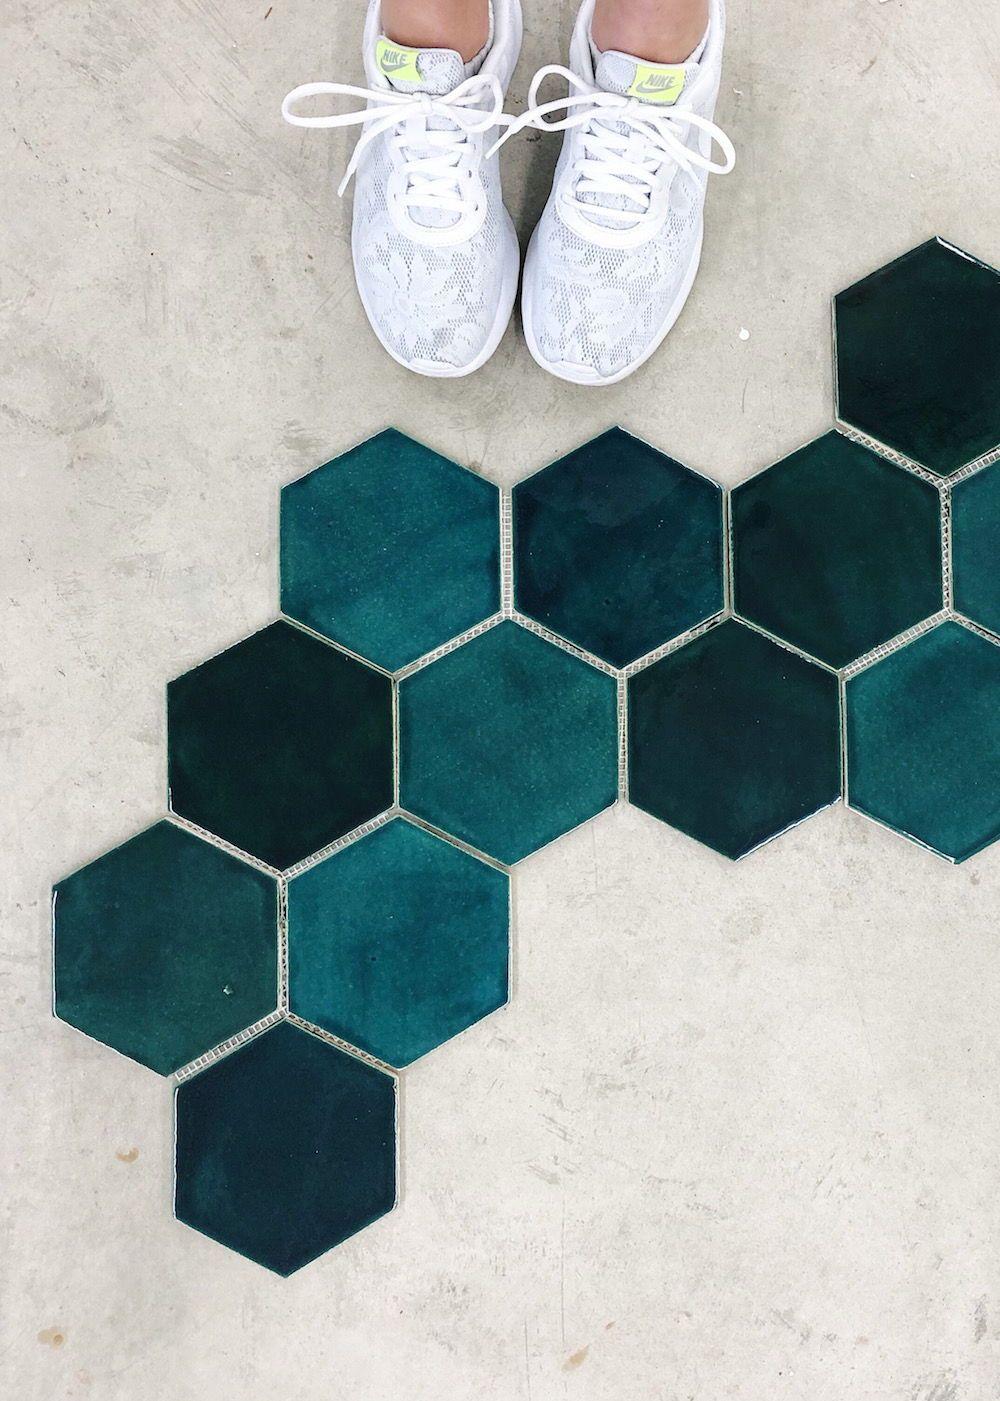 Large Hexagon 1036w Bluegrass Hexagon Tile Floor Hexagon Hexagon Tile Bathroom